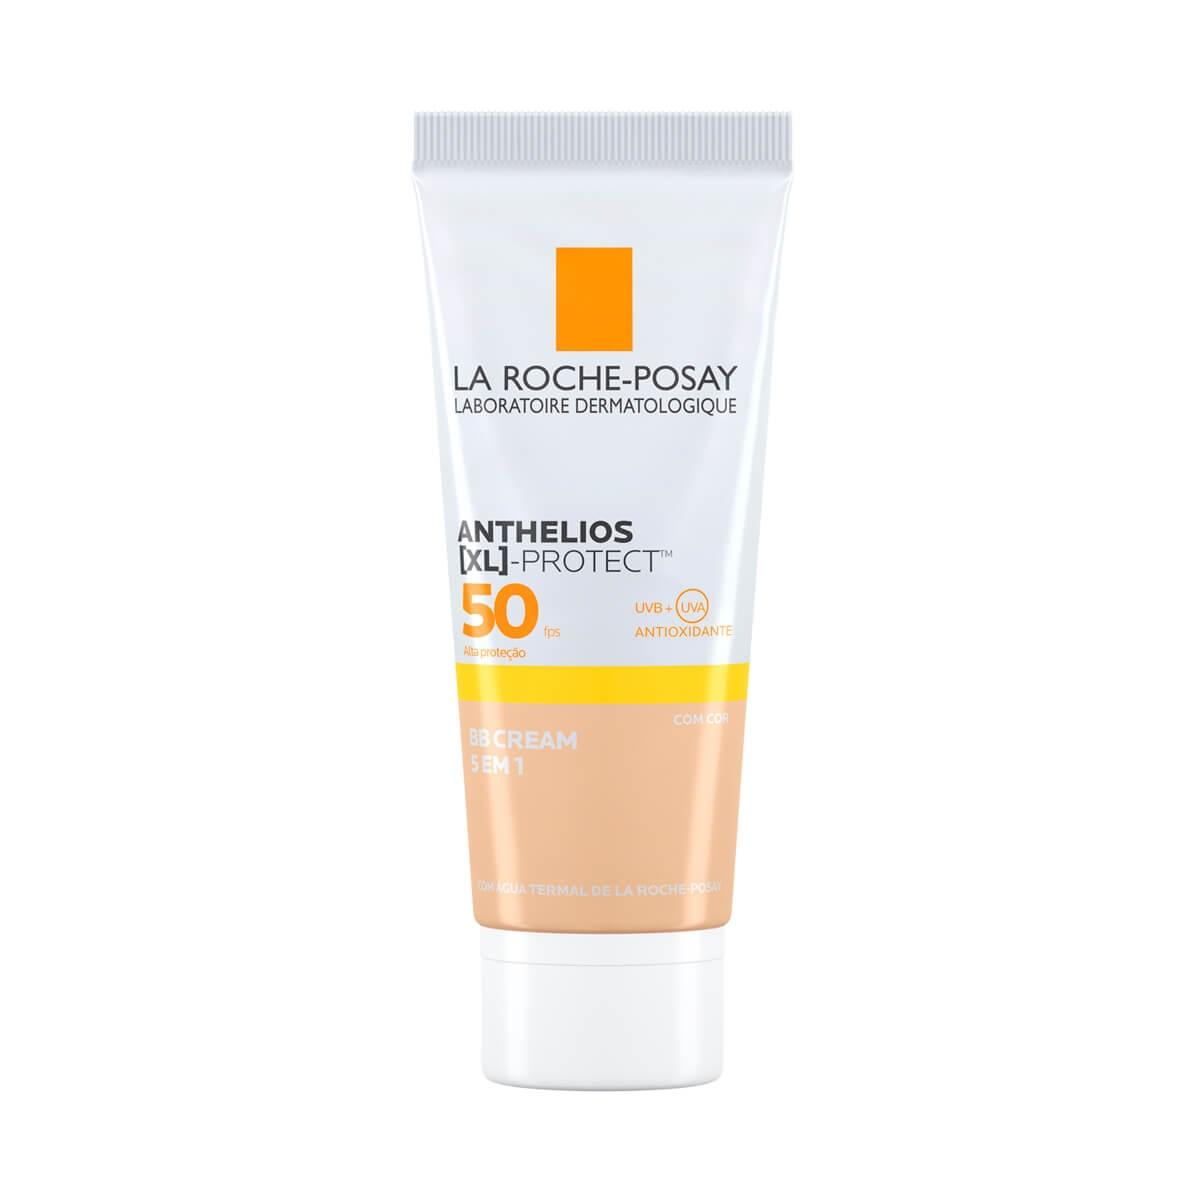 Protetor Solar Facial La Roche-Posay Anthelios BB Cream 5 em 1 Cor Universal FPS 50 com 40g 40g